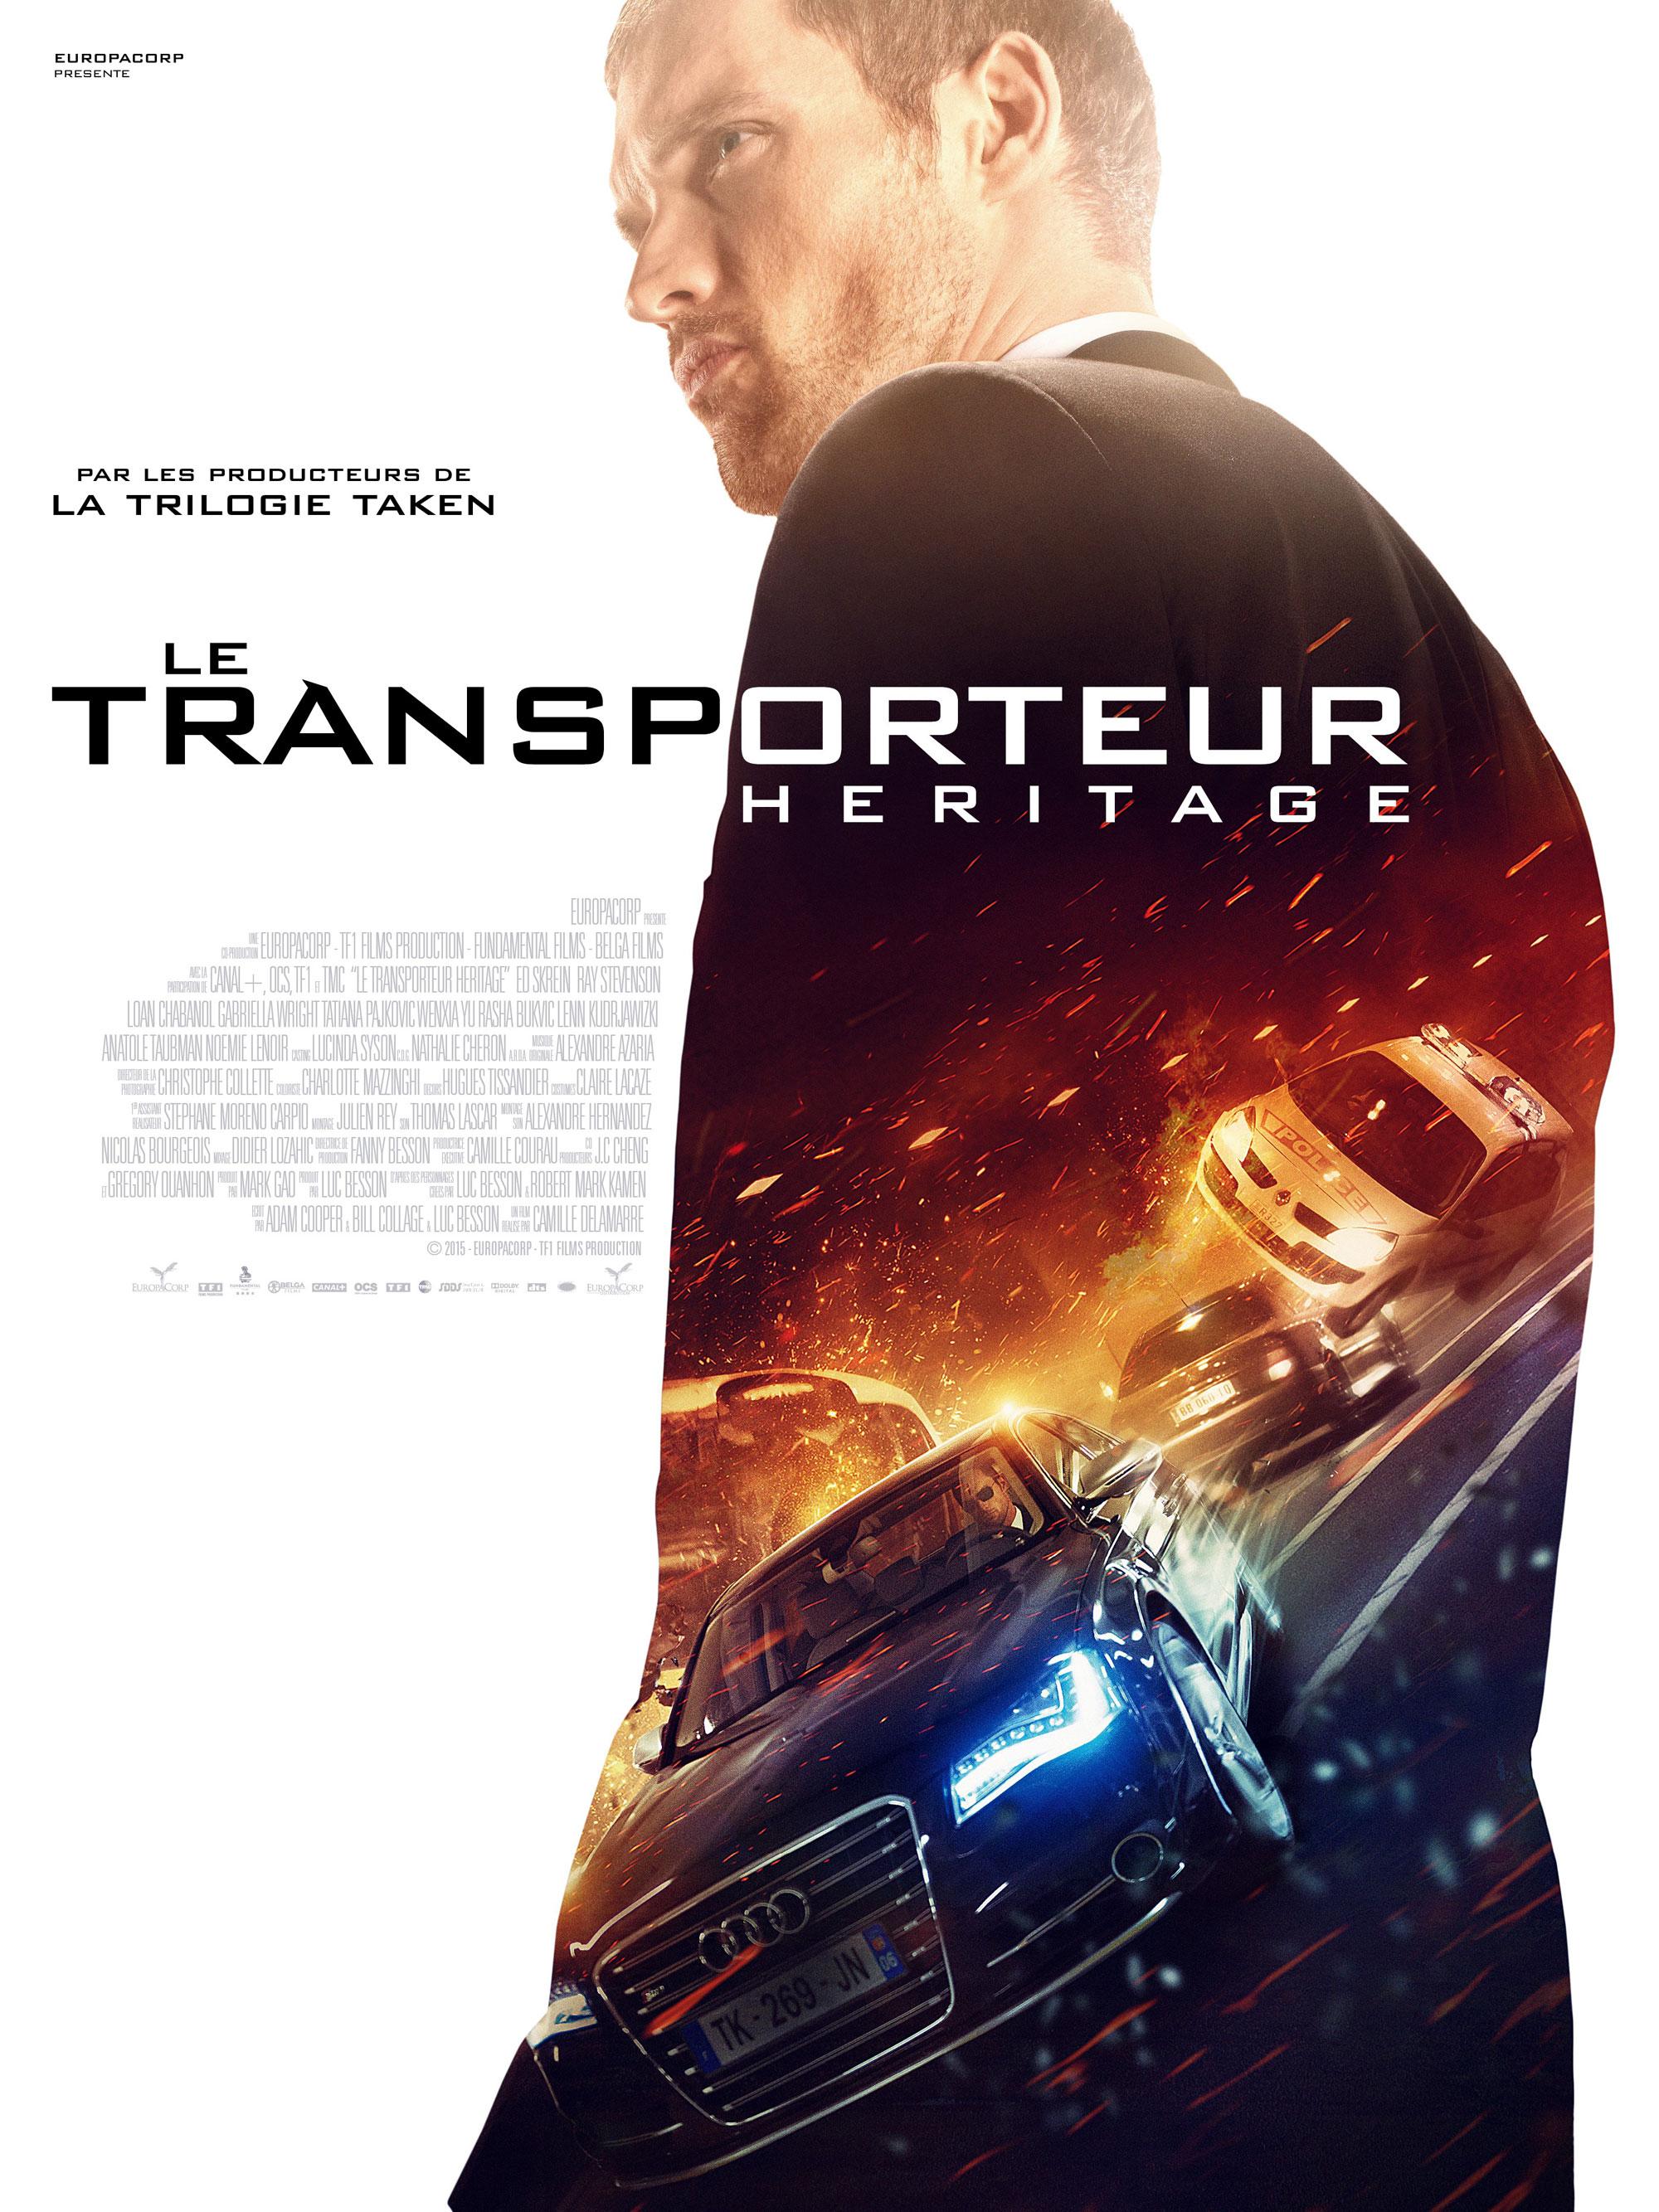 Transporteur héritage- Affiche